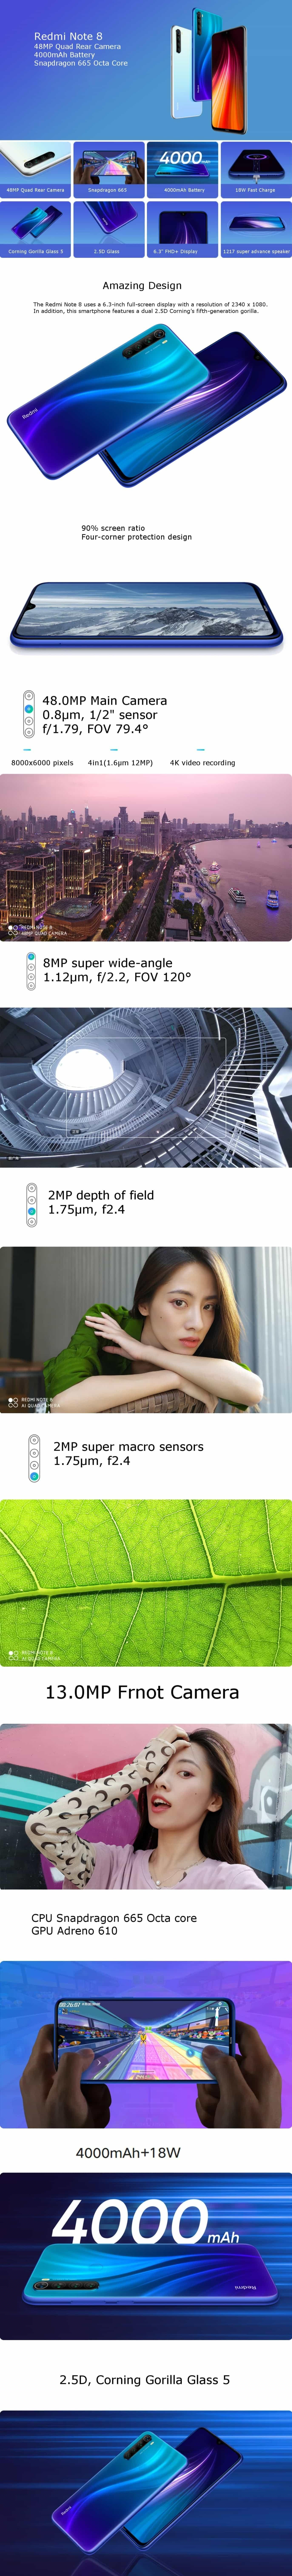 Prezentare-Xiaomi-Redmi-Note-85237a8ead01053c4.jpg